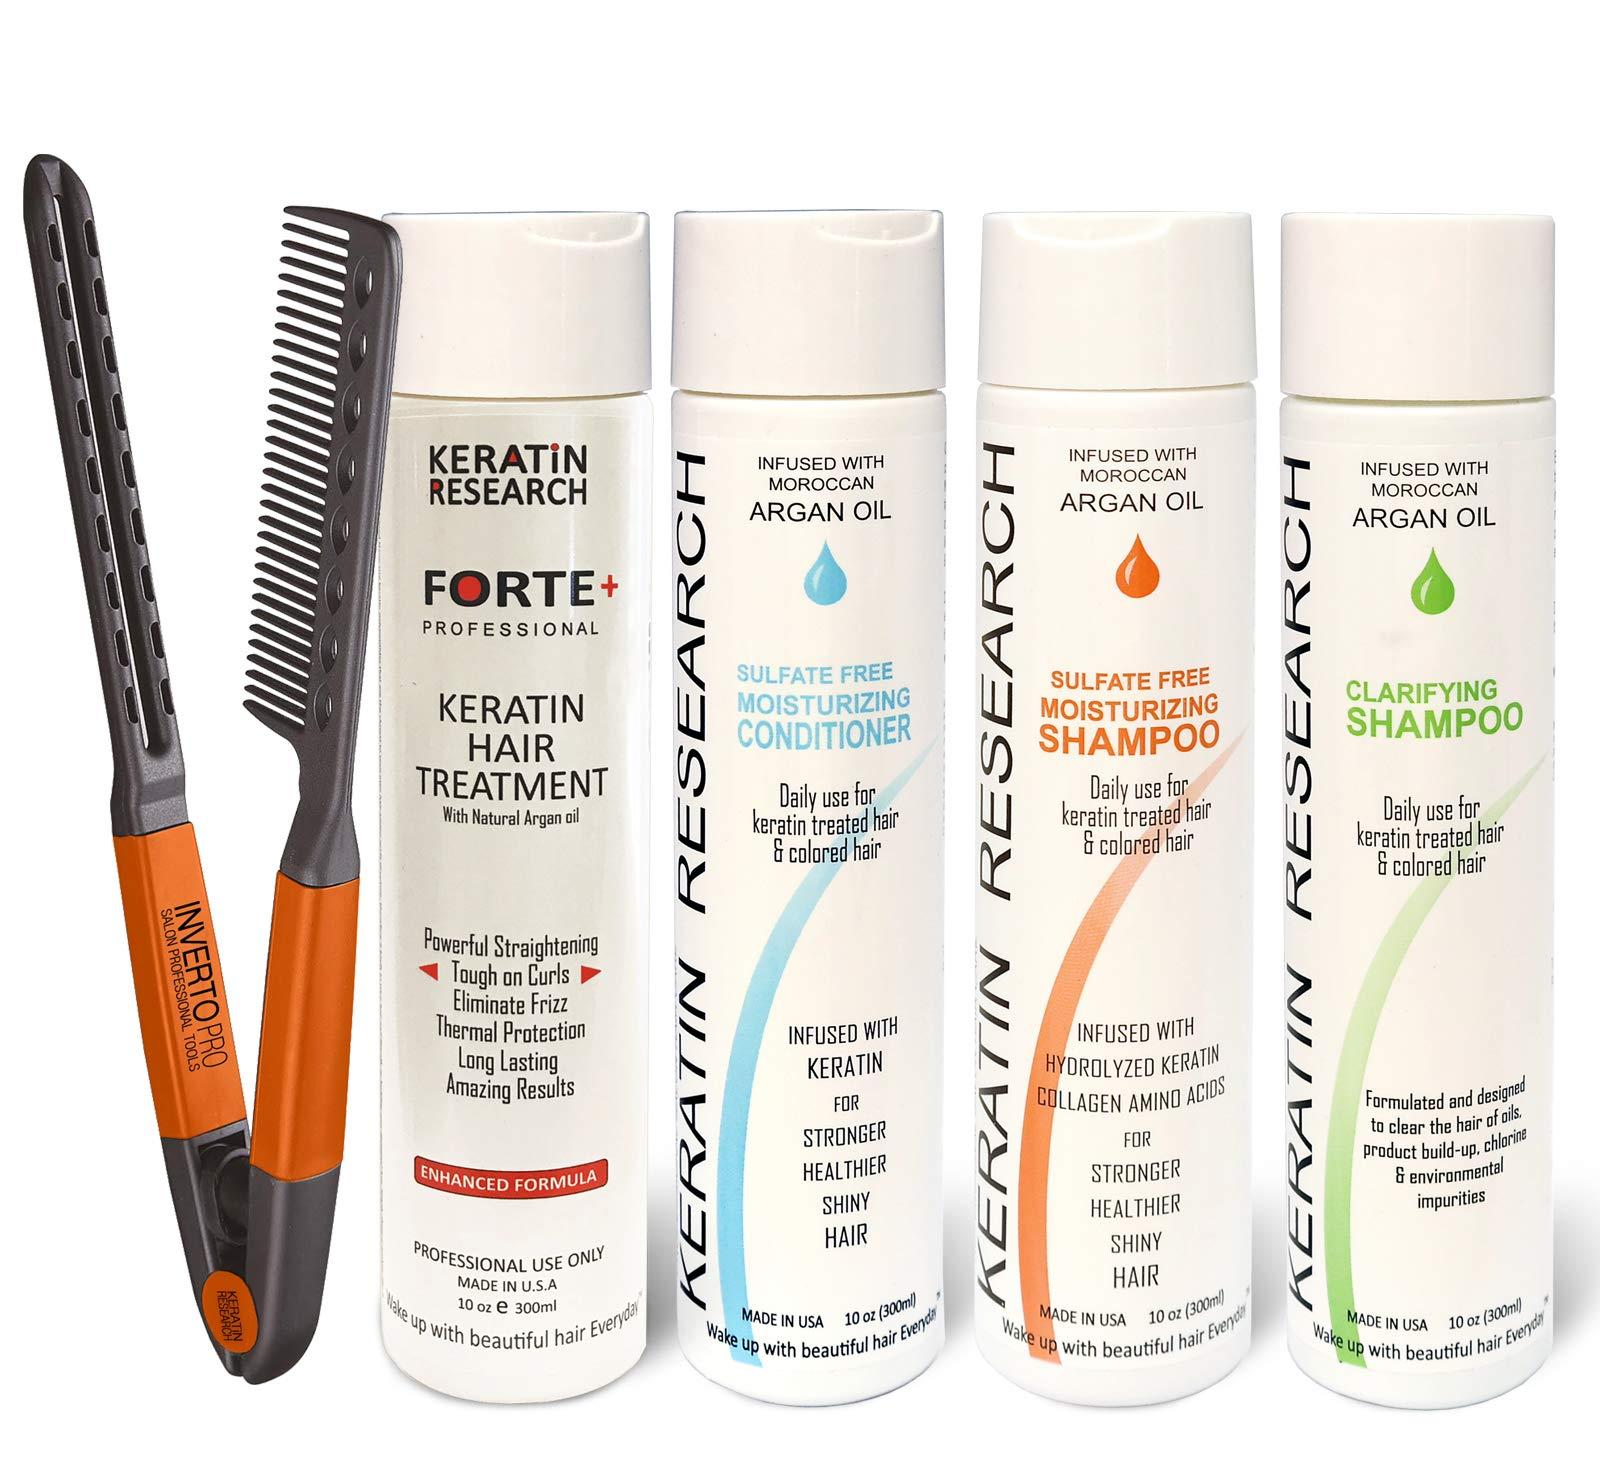 Forte Plus Extra Strength Brazilian Keratin Hair Treatment Professional 300ml Set Including Moisturizing Shampoo, Moisturizing Conditioner, Clarifying Shampoo, Brush/Comb Proven Amazing Results